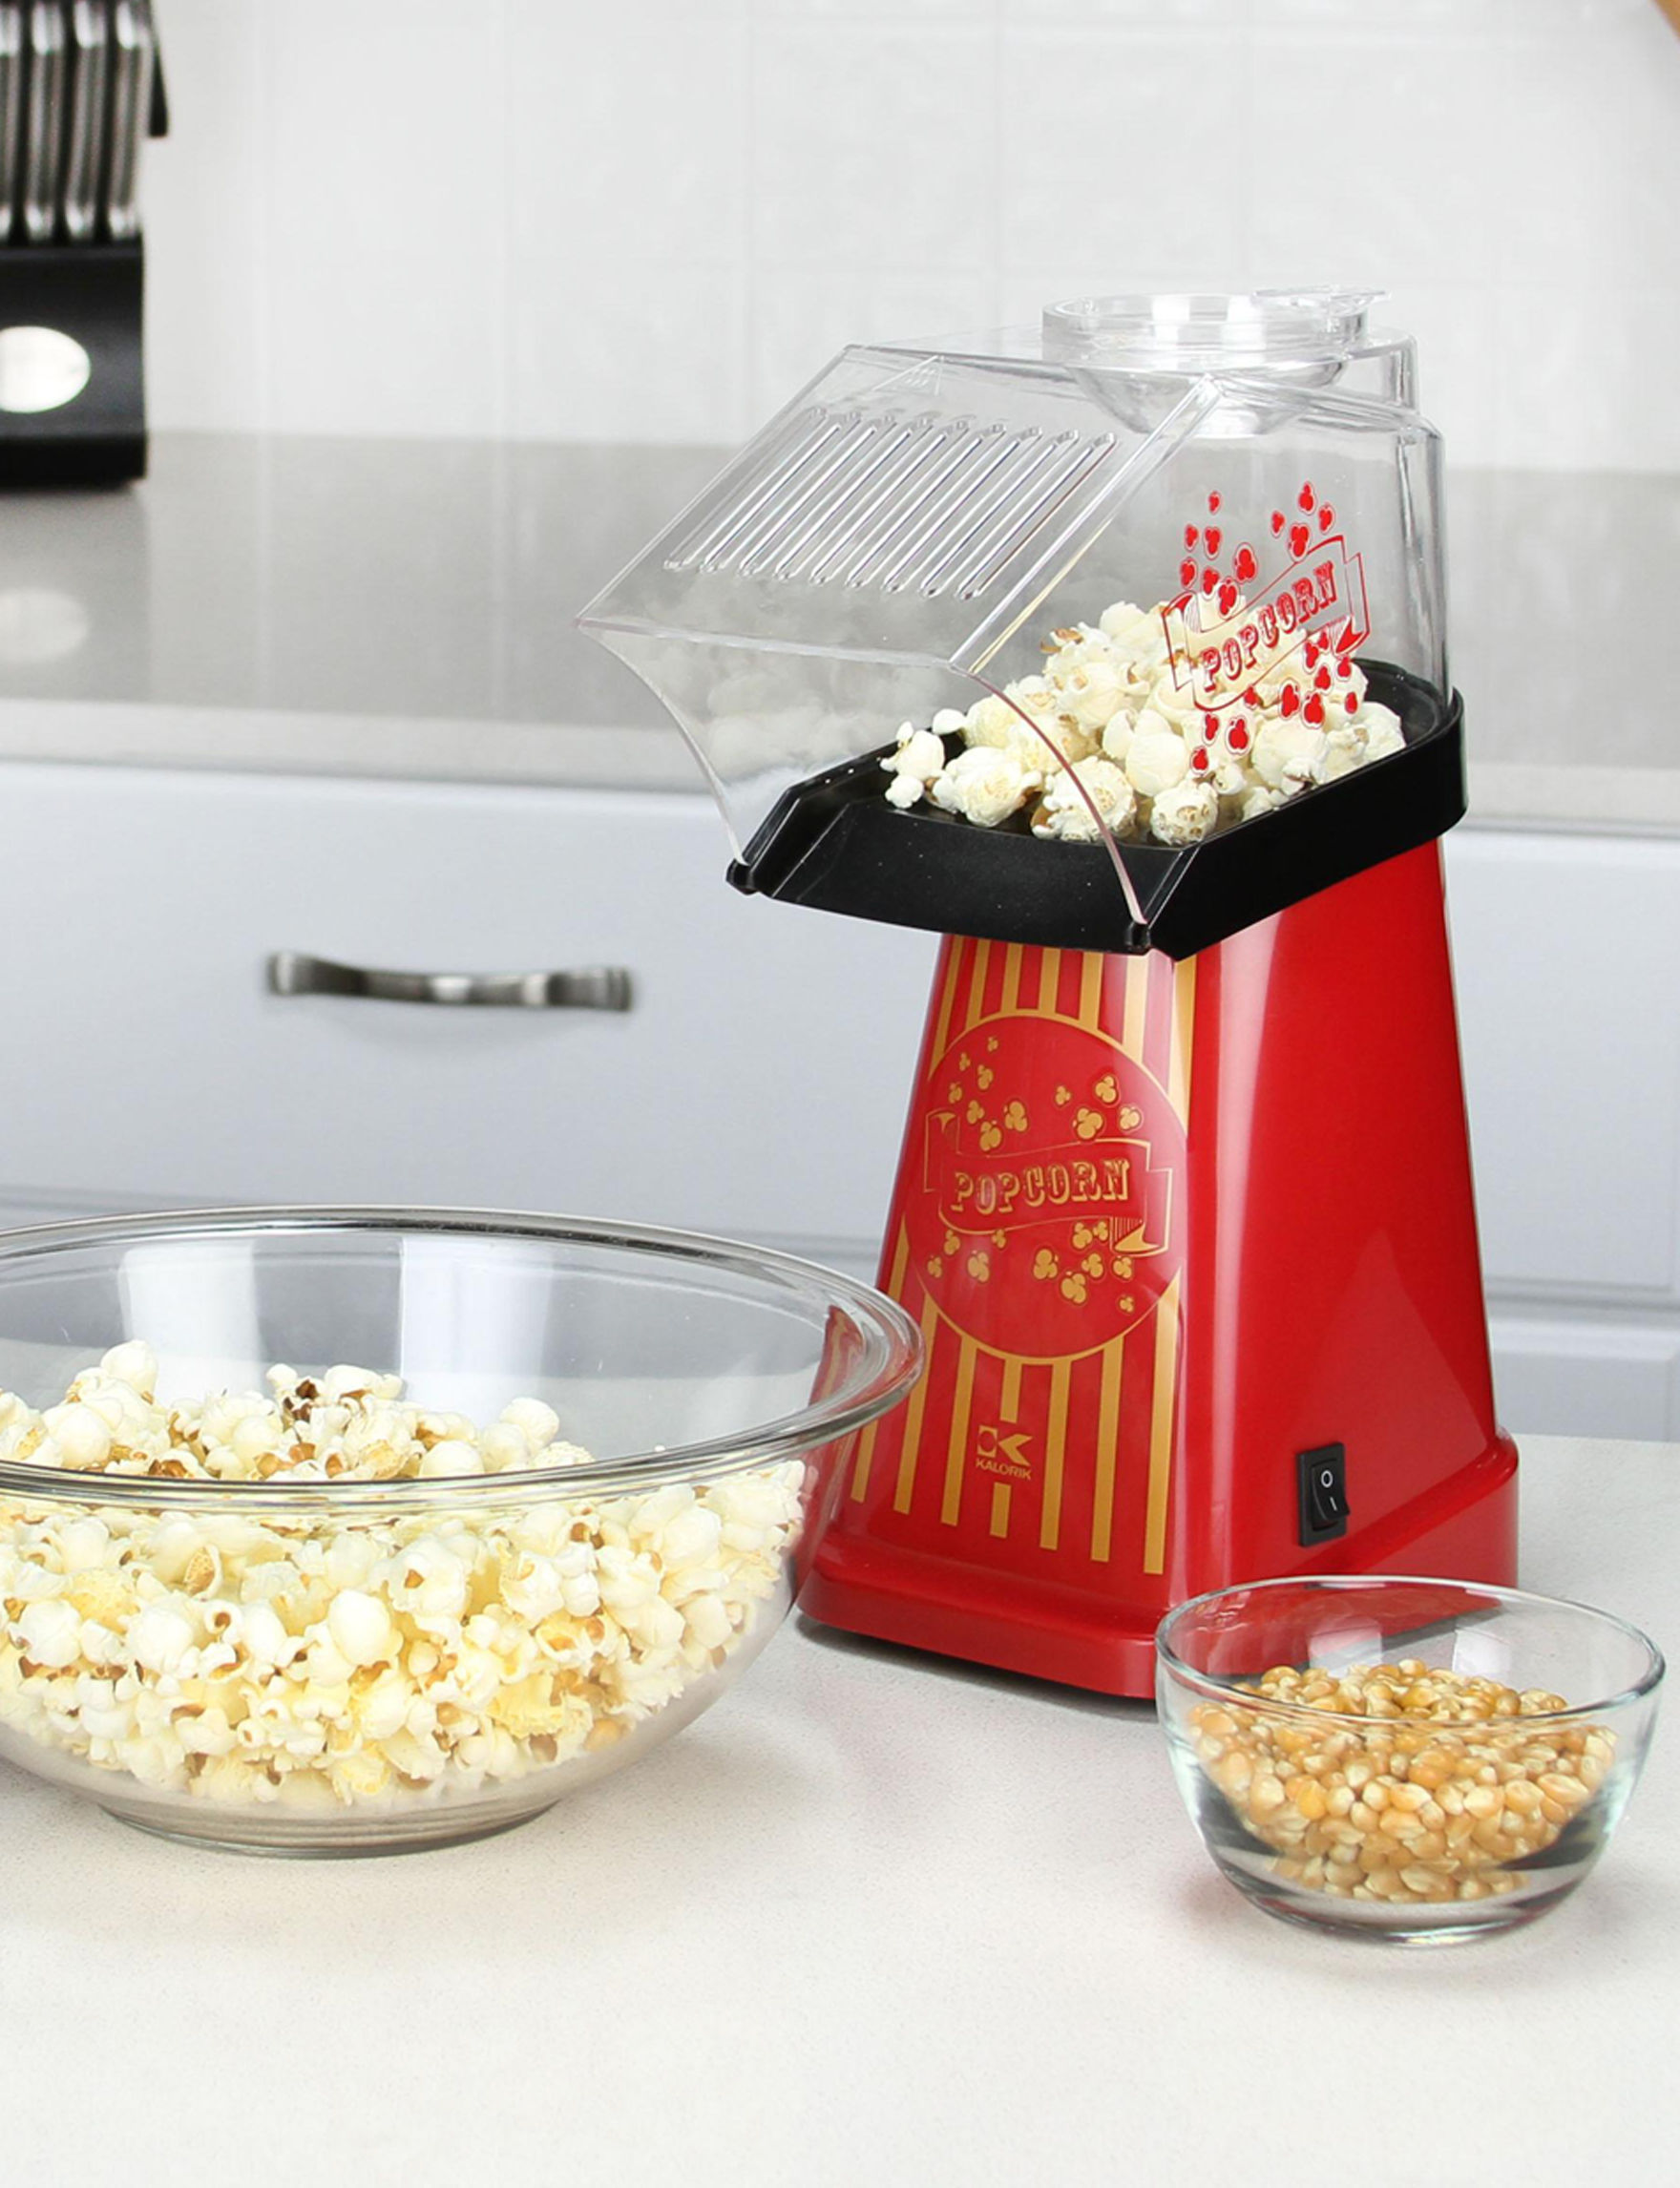 Kalorik Red Specialty Food Makers Kitchen Appliances